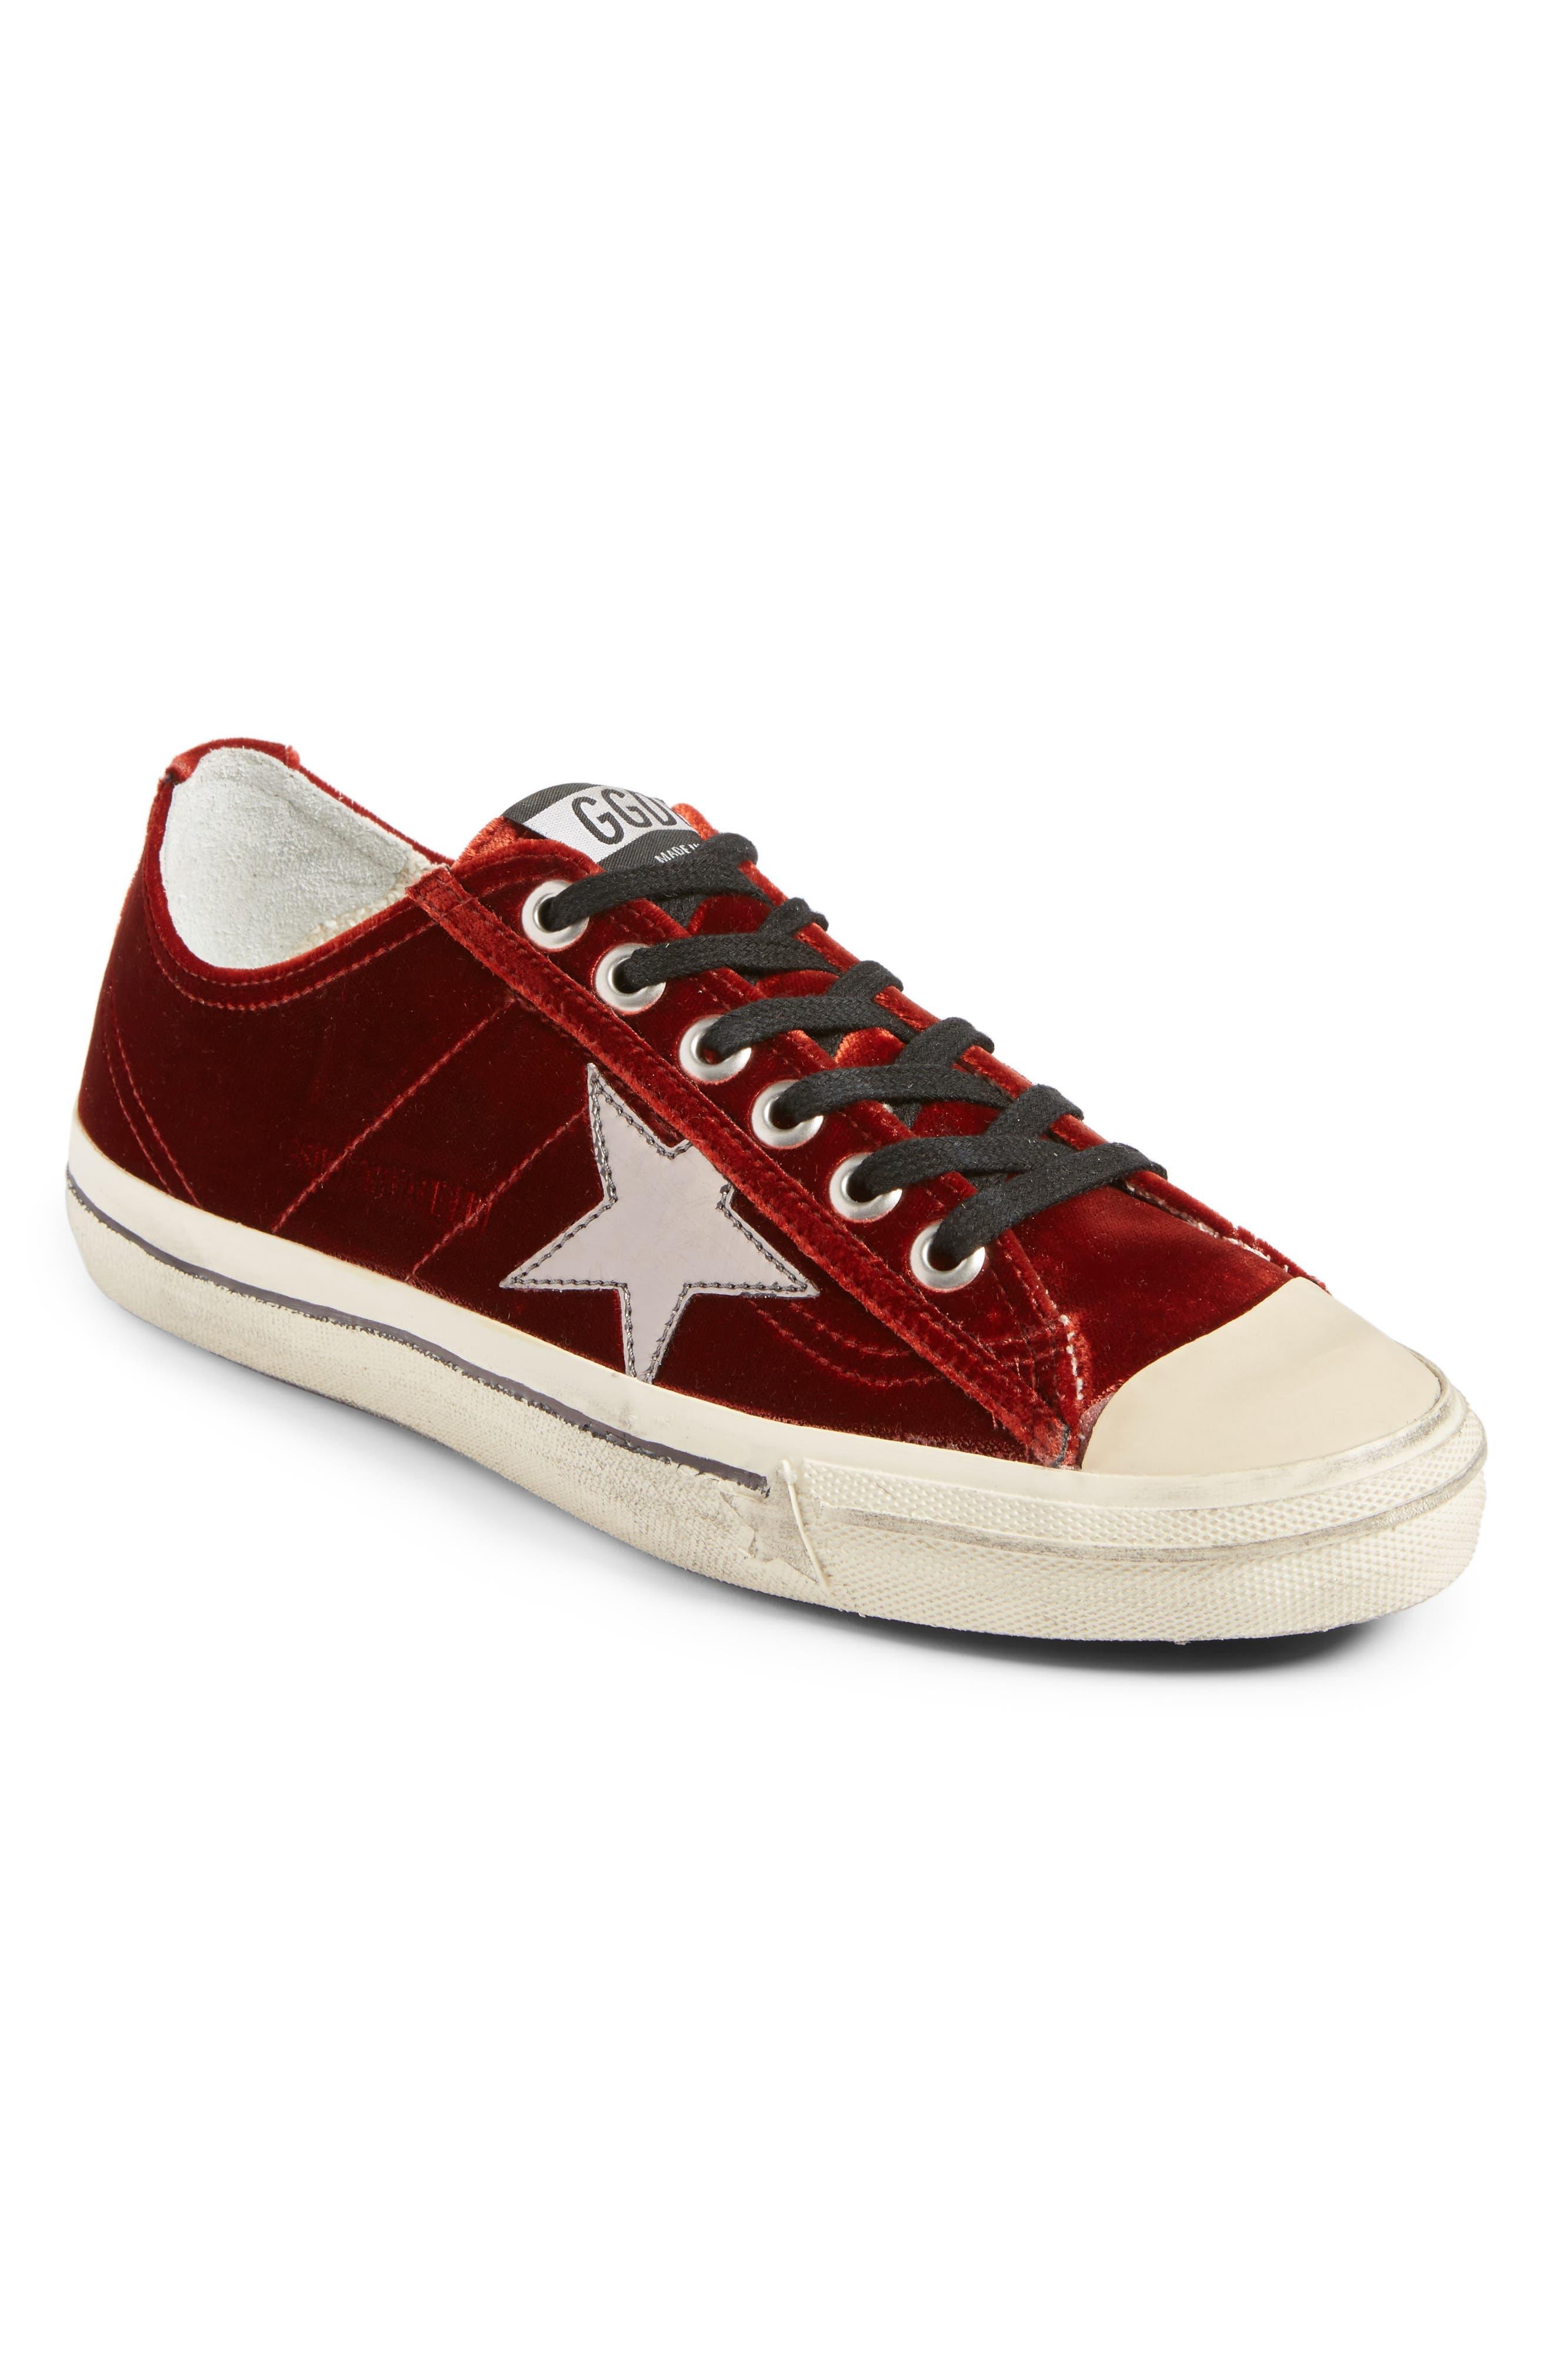 V-Star 2 Low Top Sneaker,                             Main thumbnail 1, color,                             930